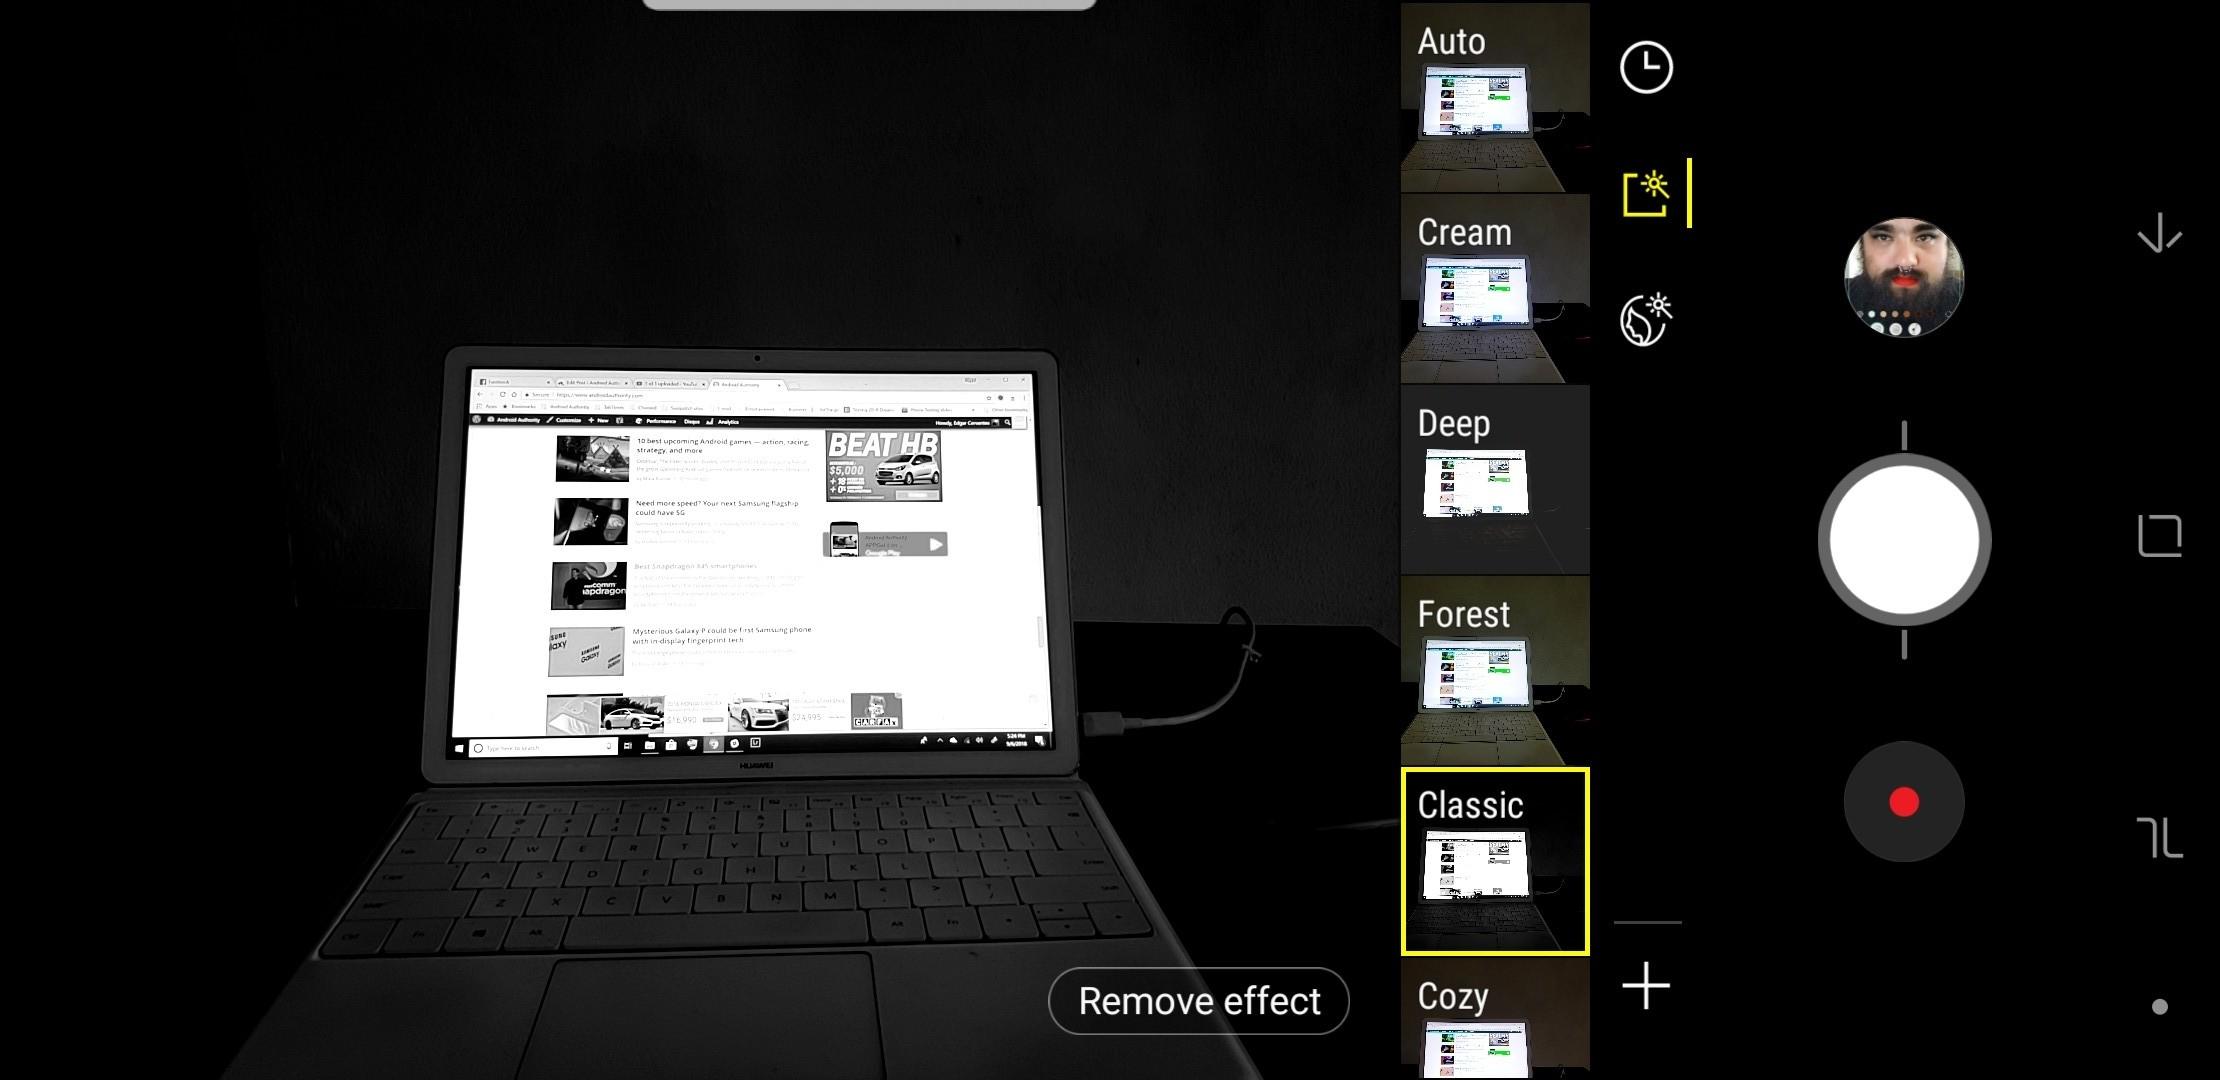 Samsung Galaxy Note 9 camera review - AIVAnet